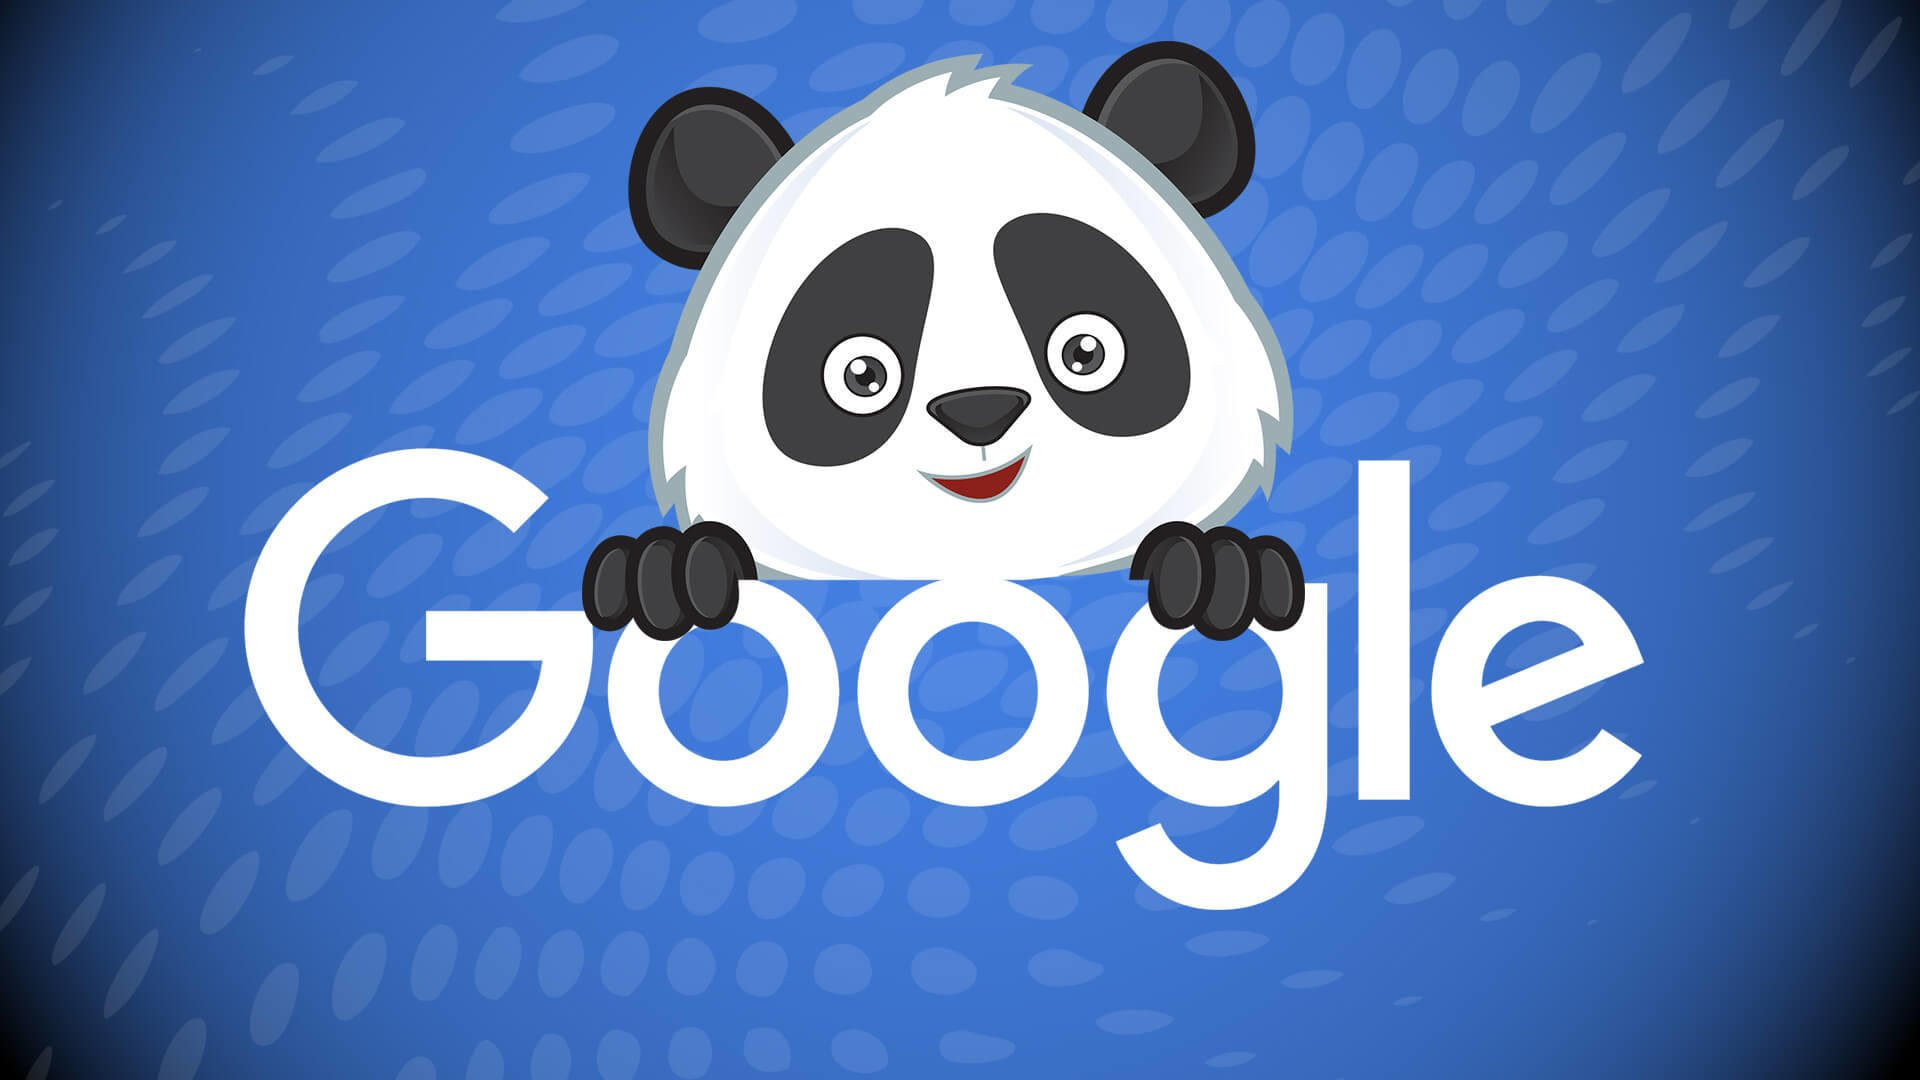 Google Fred Update Panda